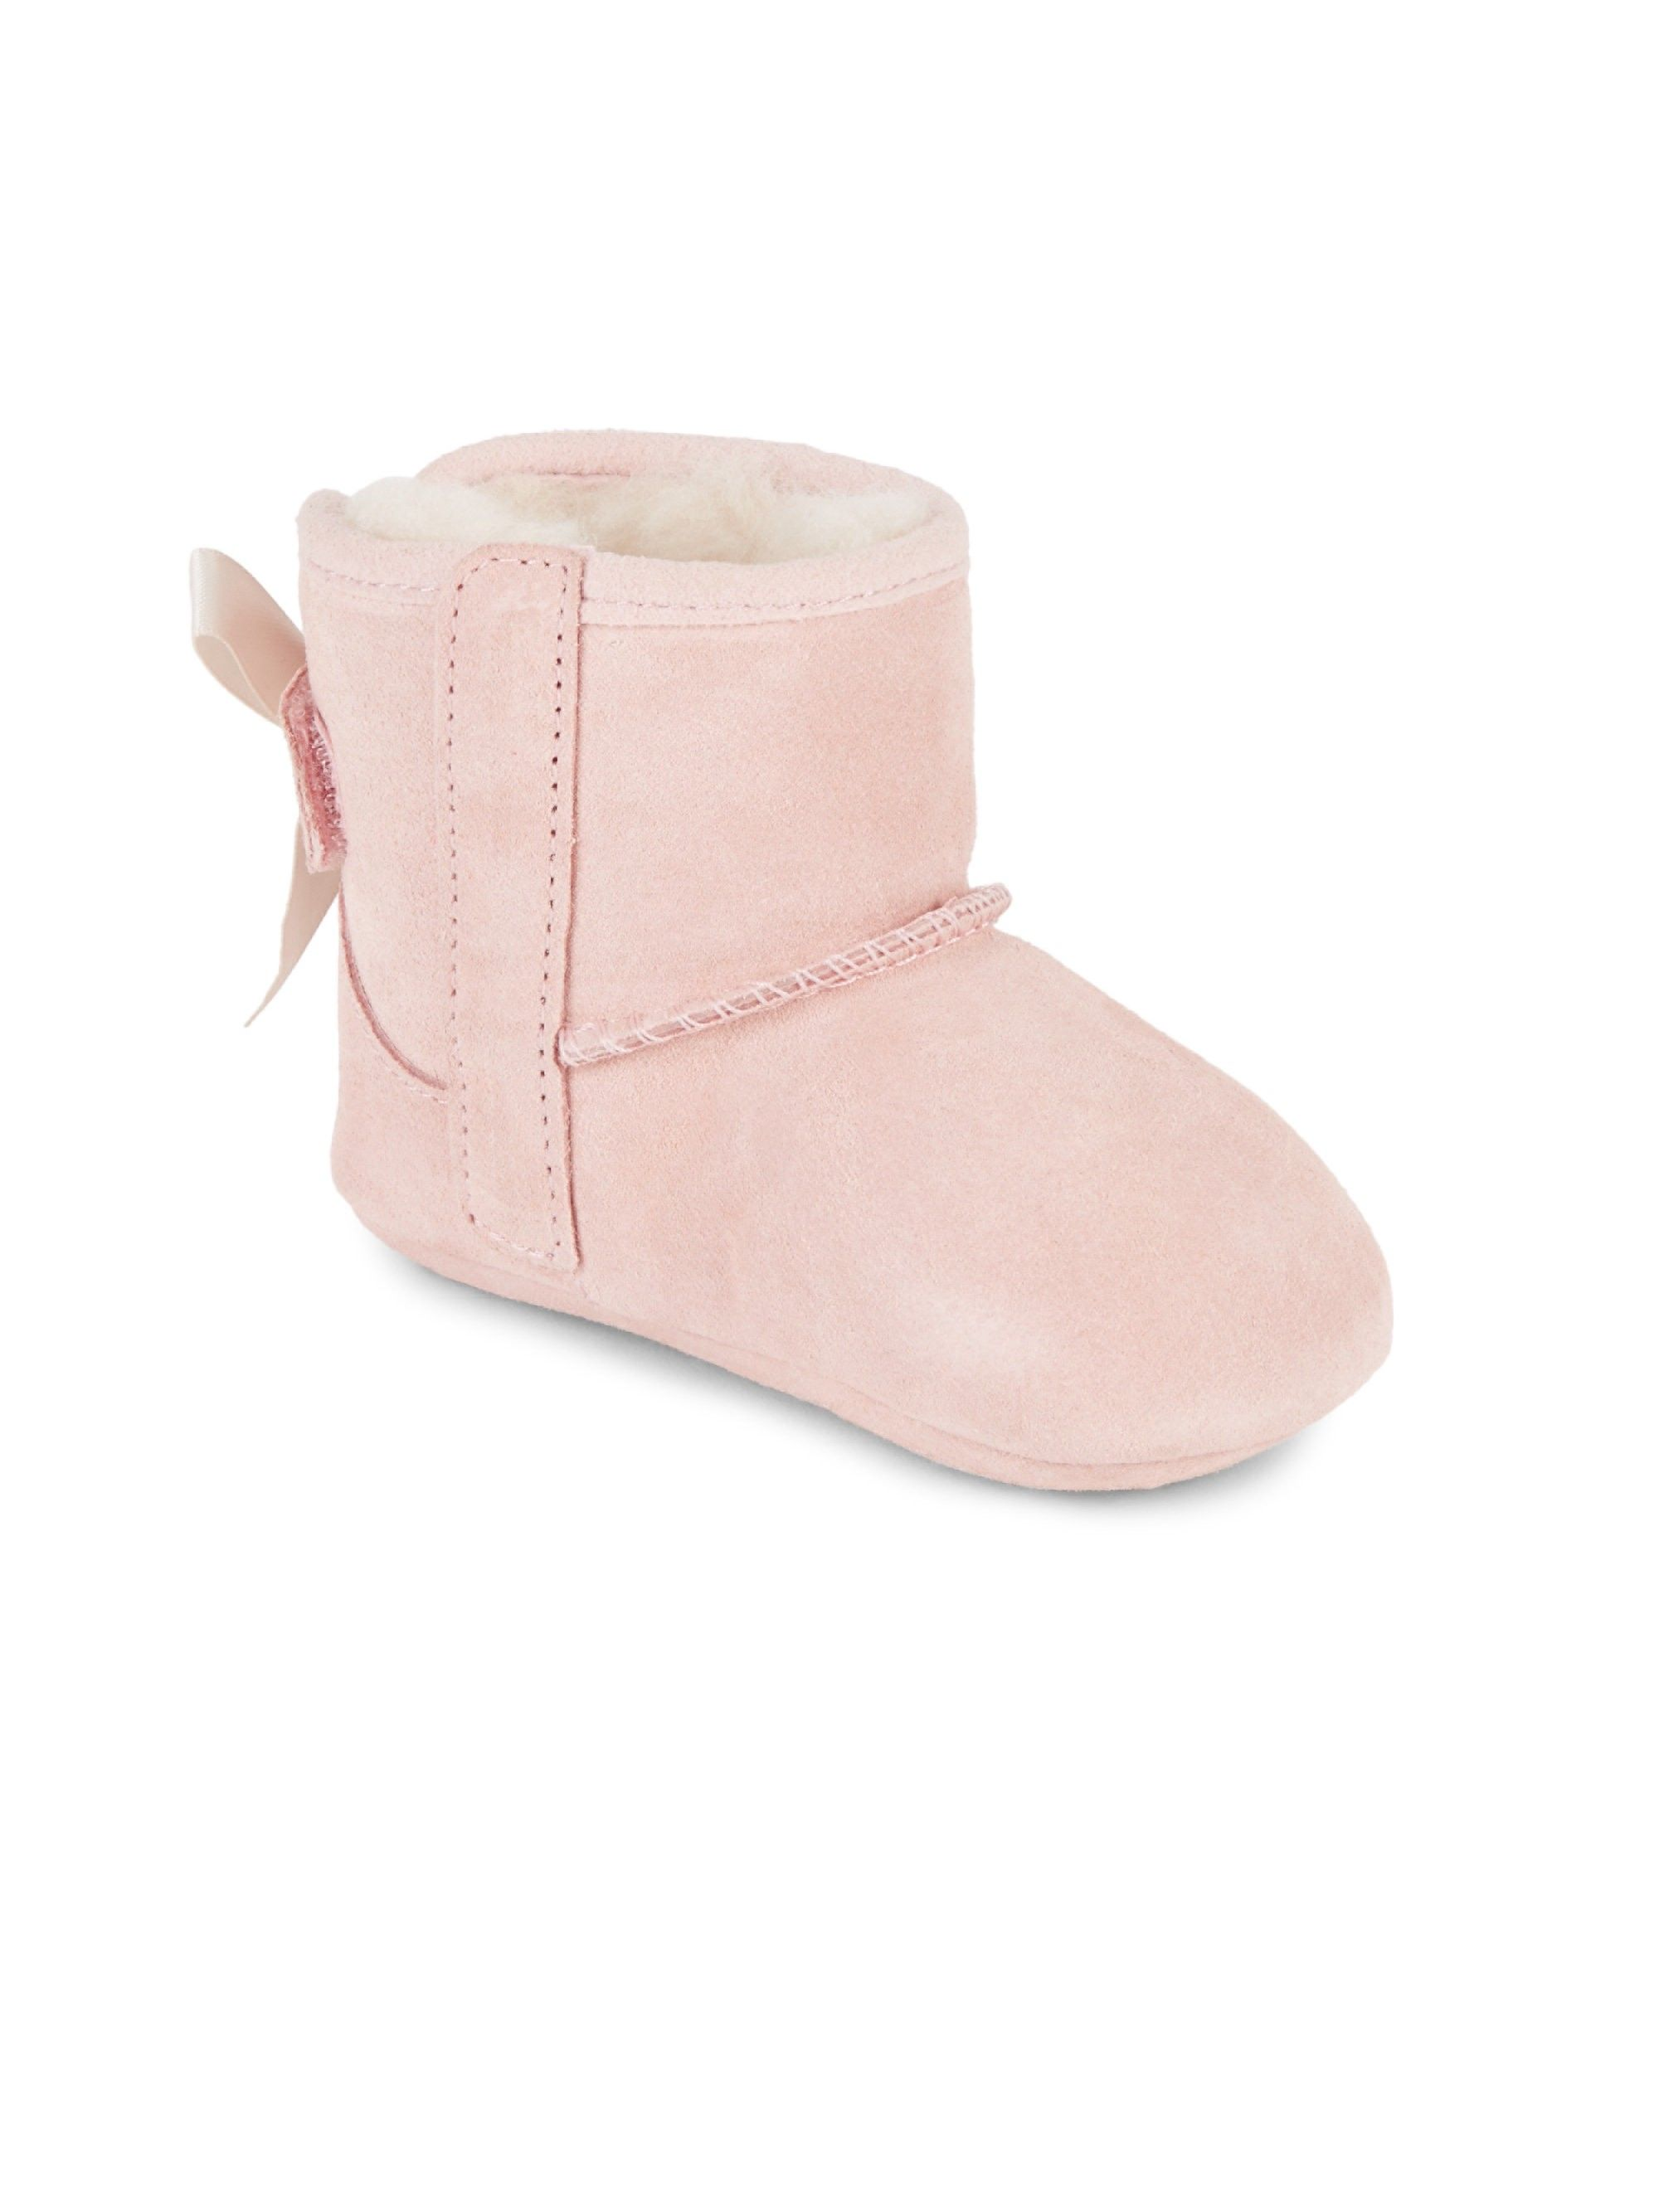 bdb63e7e776 Ugg Australia Baby Girl's Jesse Bow II Suede Booties - Pink Small (2 ...